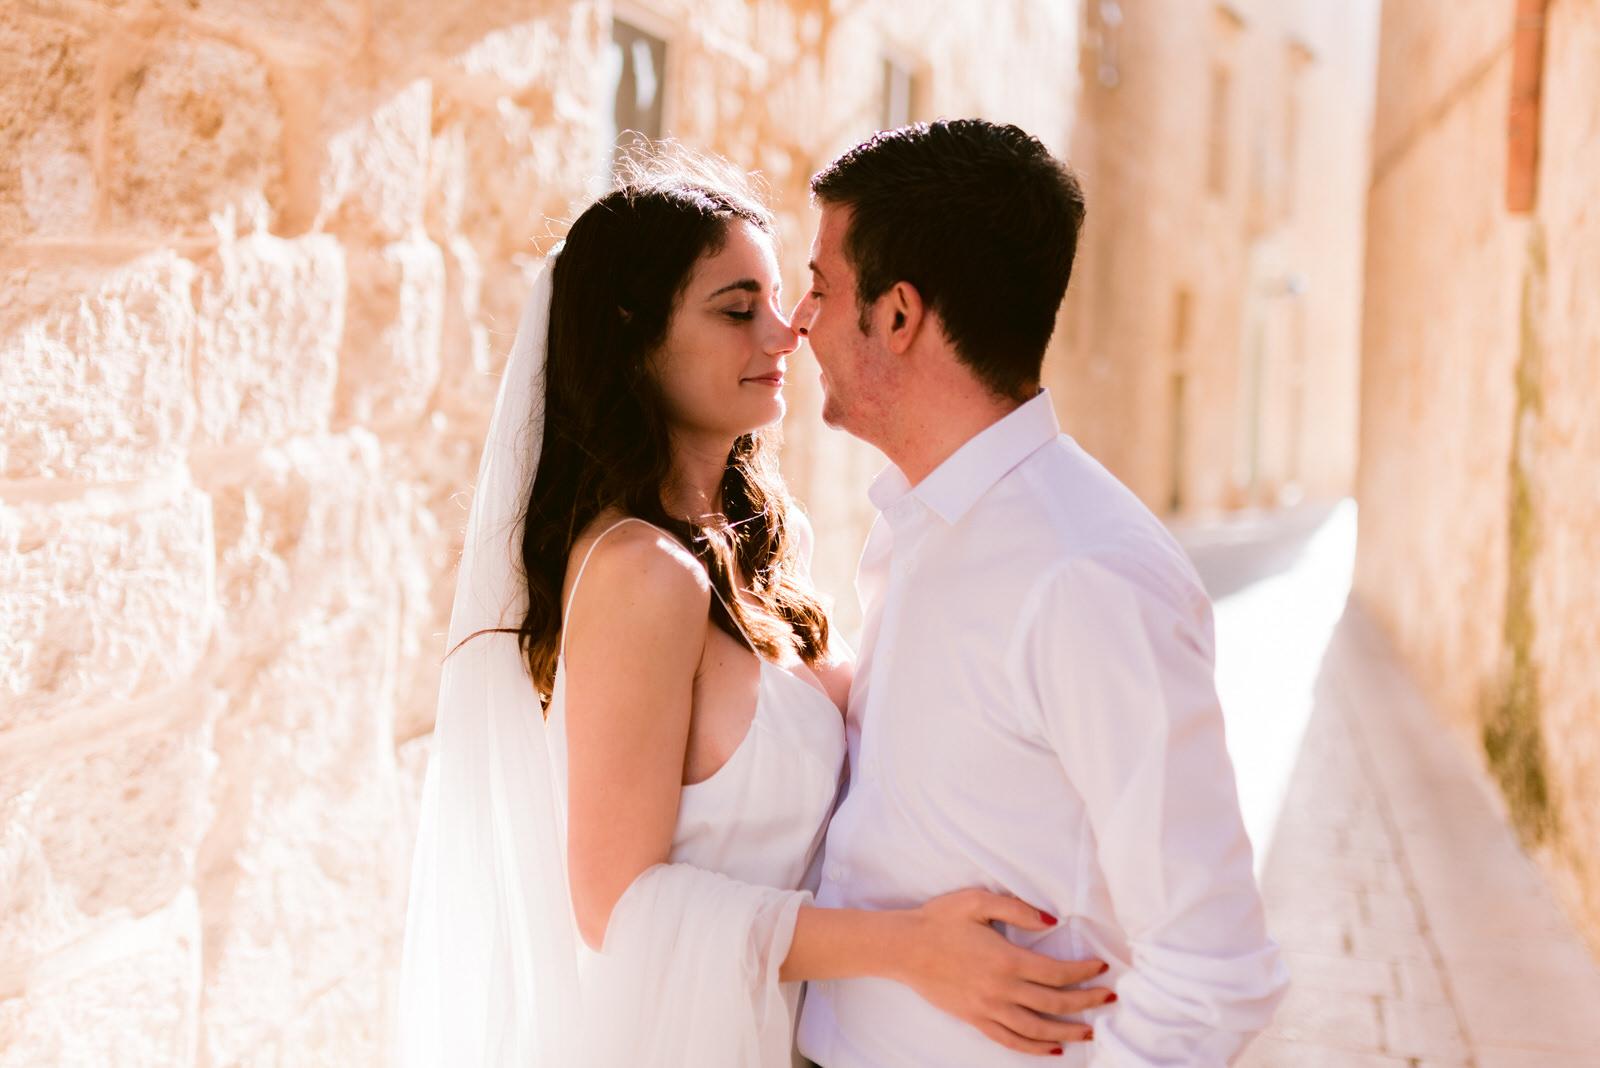 mdina wedding, malta wedding photography, malta elopement, golden bay malta wedding photos, wedding photographer malta, malta wedding venue, villa bologna wedding (42).jpg